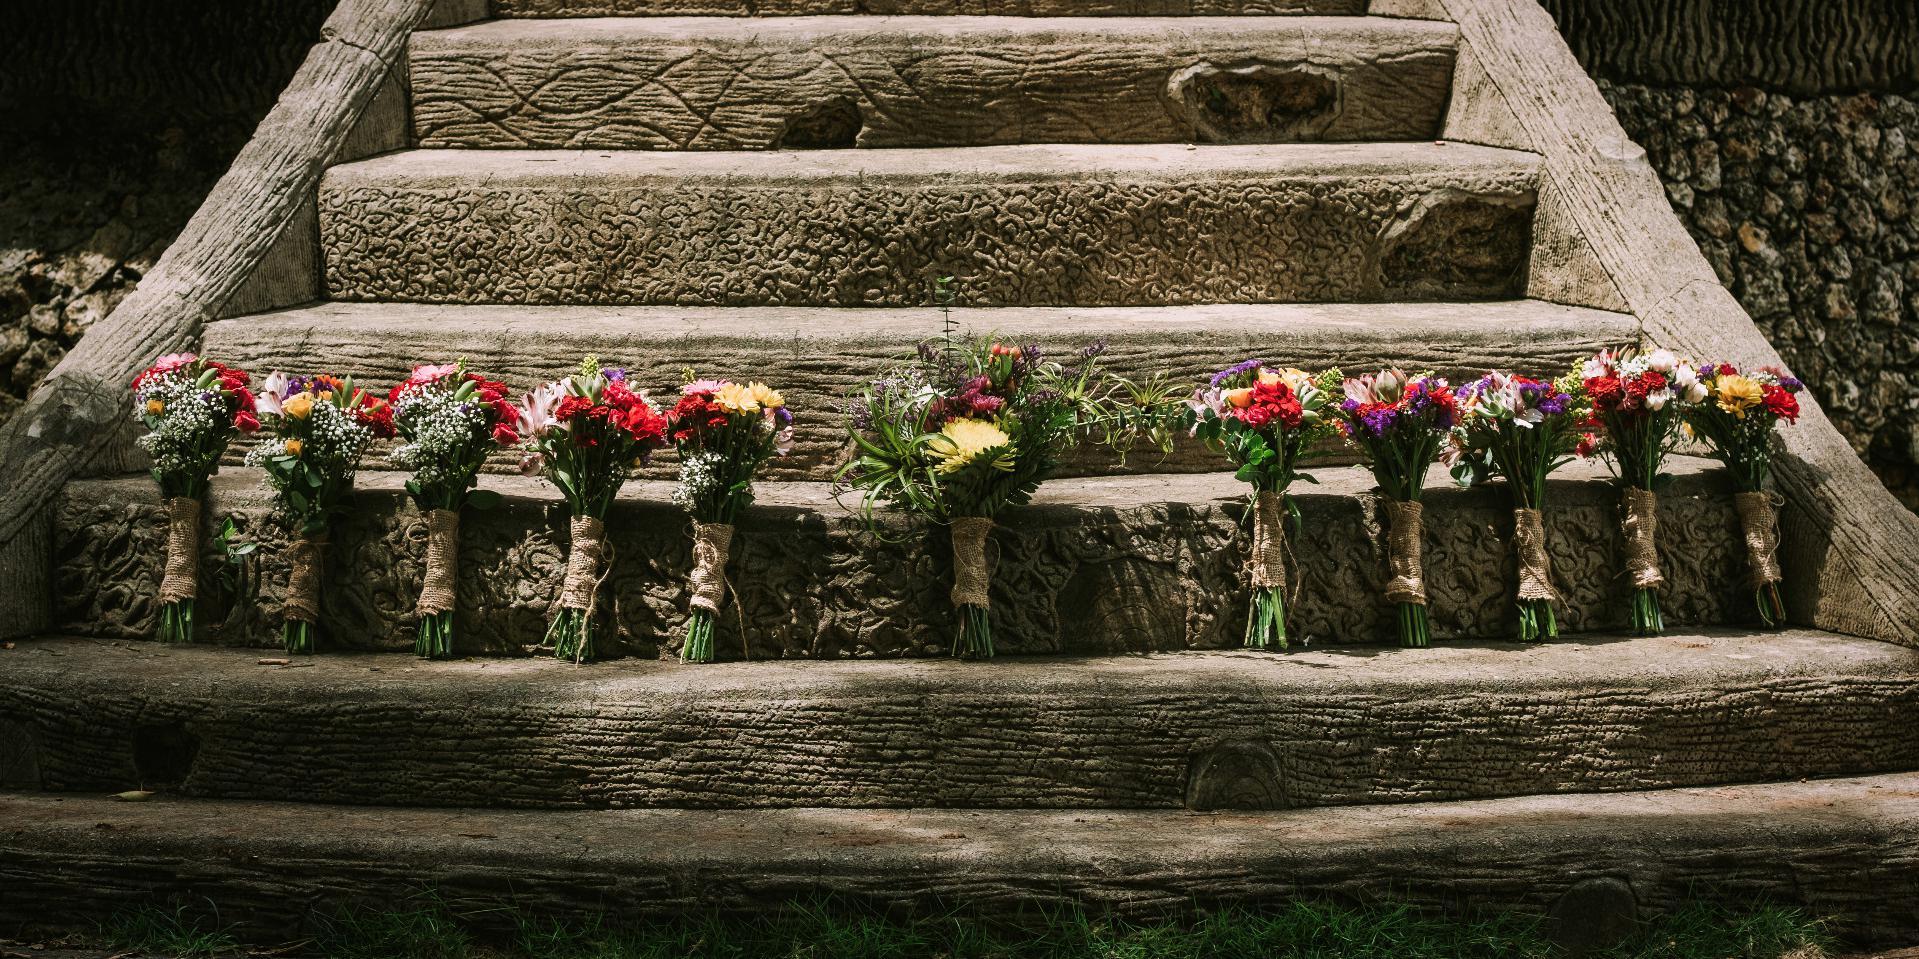 bodas-sin-clasificar-sin-tema-cuba-29111.jpg